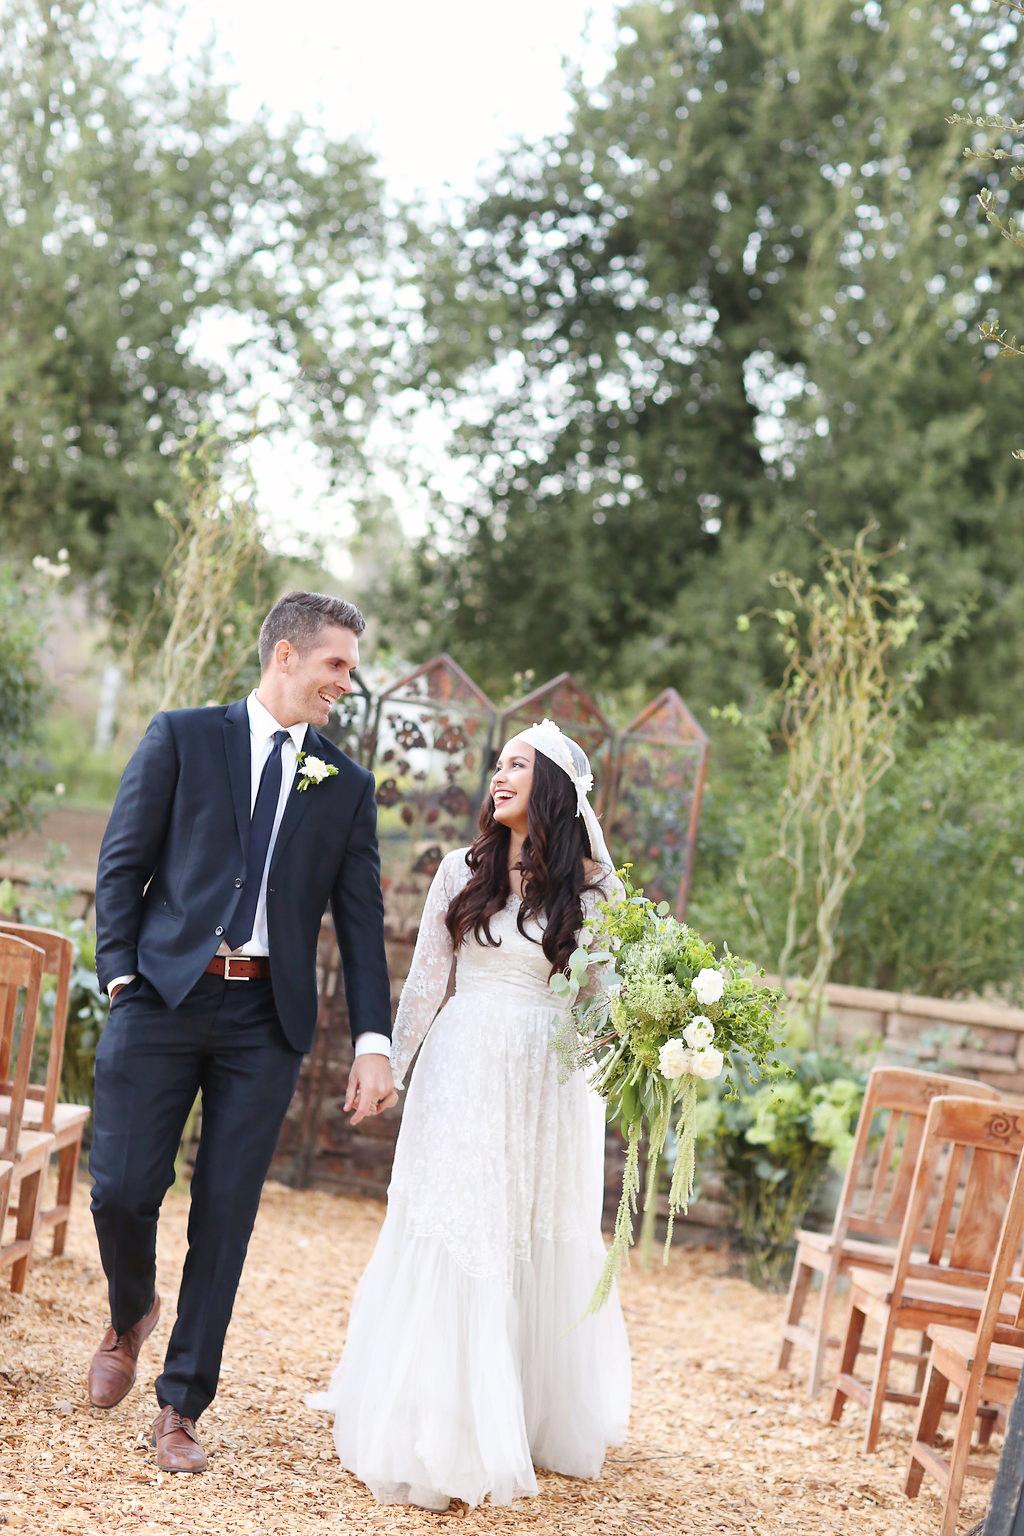 Bride in a vintage wedding dress with vintage veil and groom.